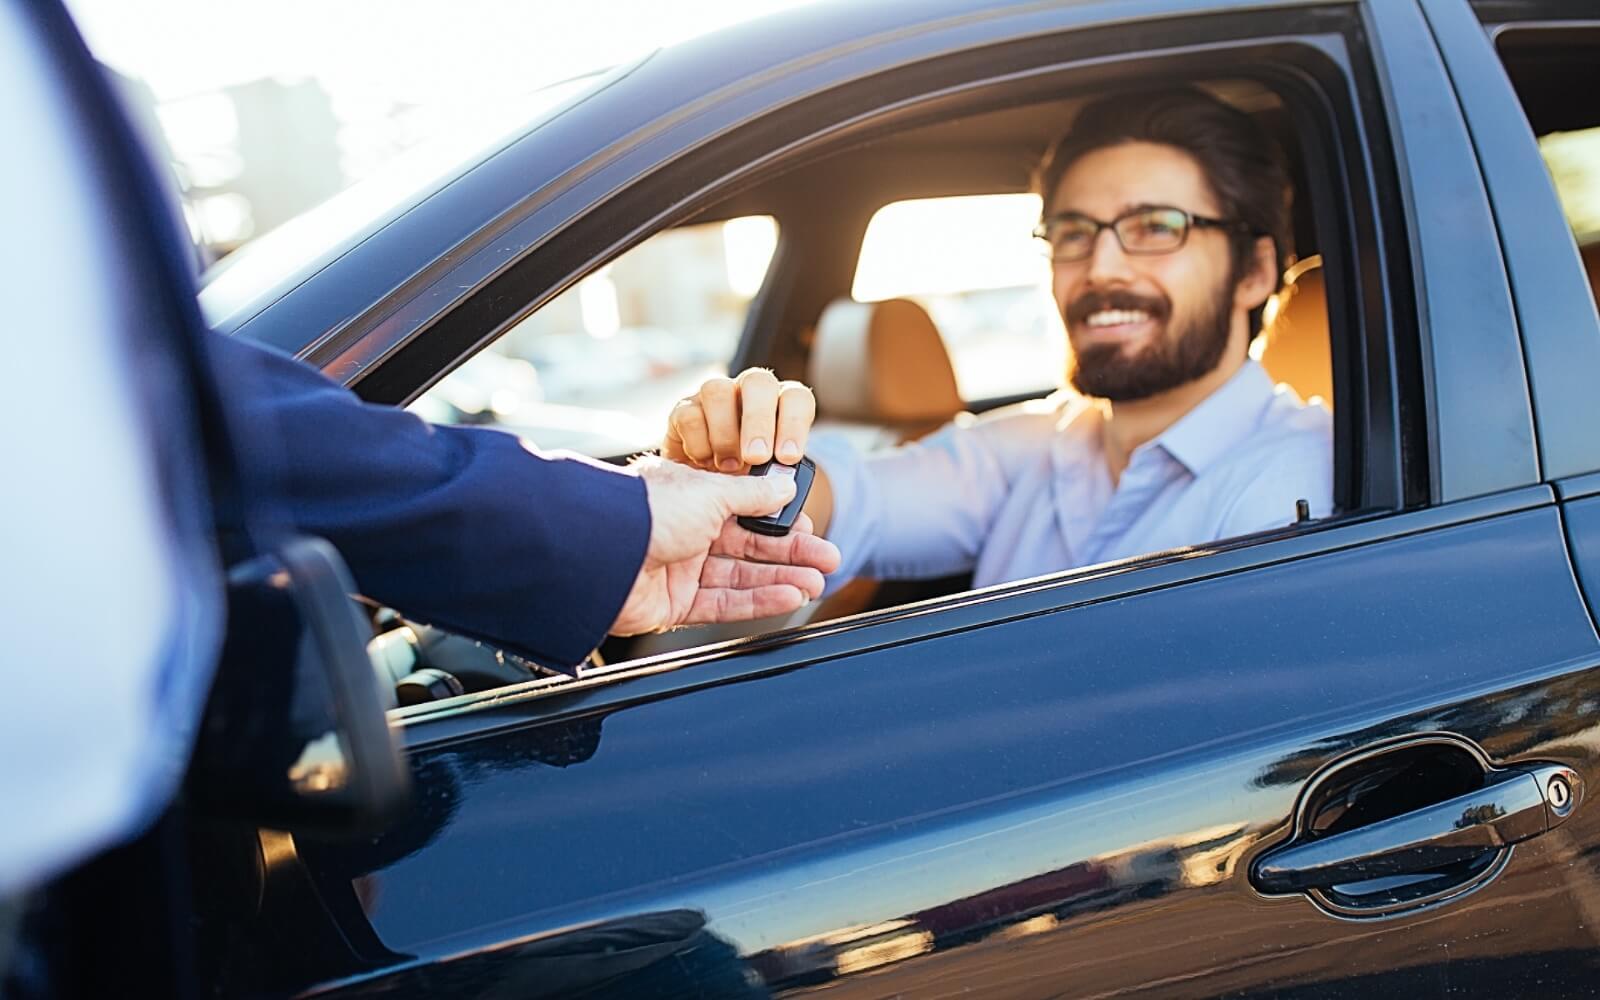 A man receives his rental vehicle